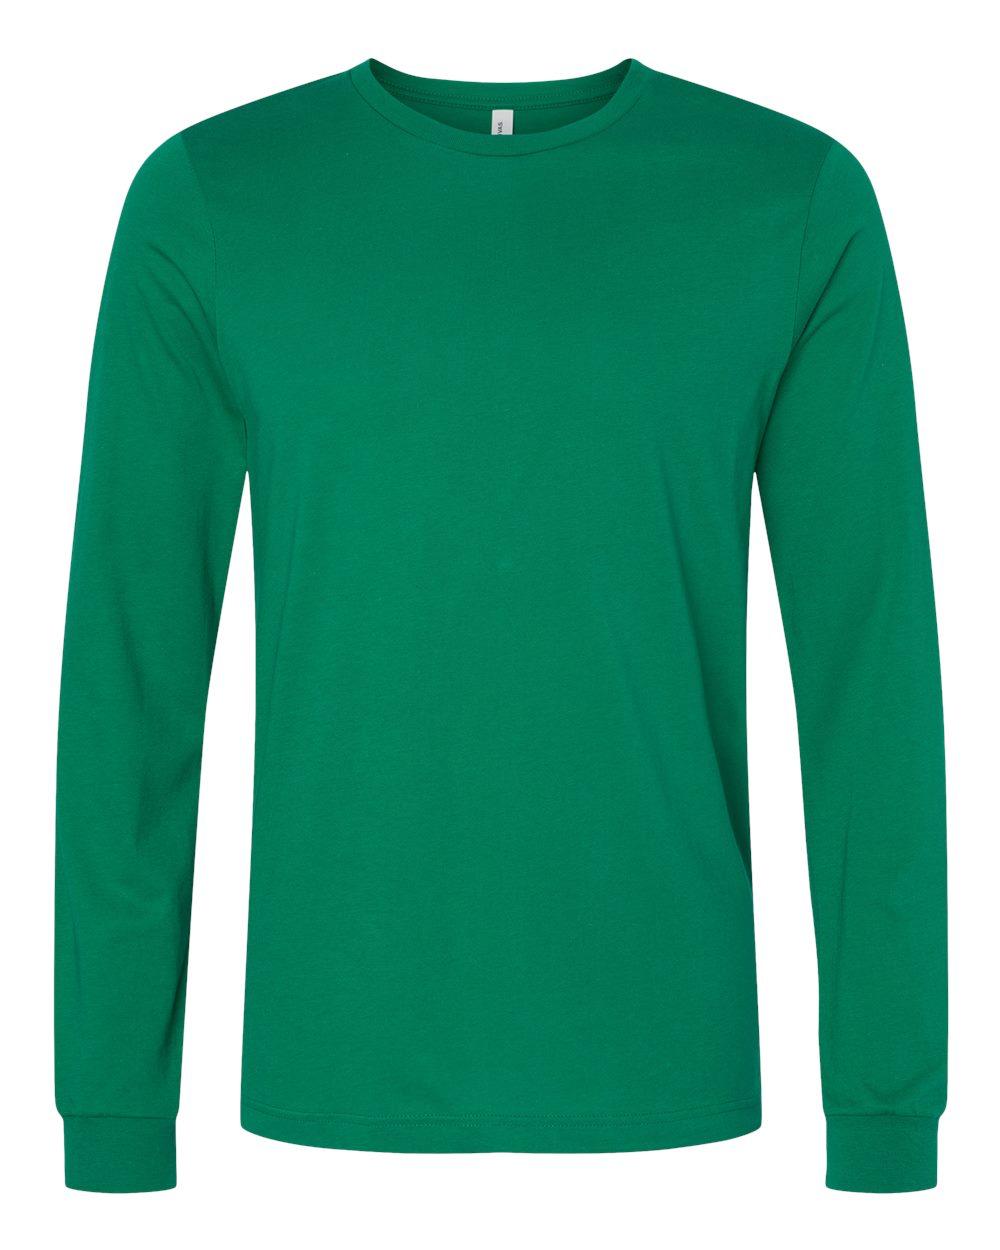 Bella-Canvas-Mens-Blank-Top-Long-Sleeve-Jersey-Tee-T-Shirt-3501-up-to-3XL thumbnail 39